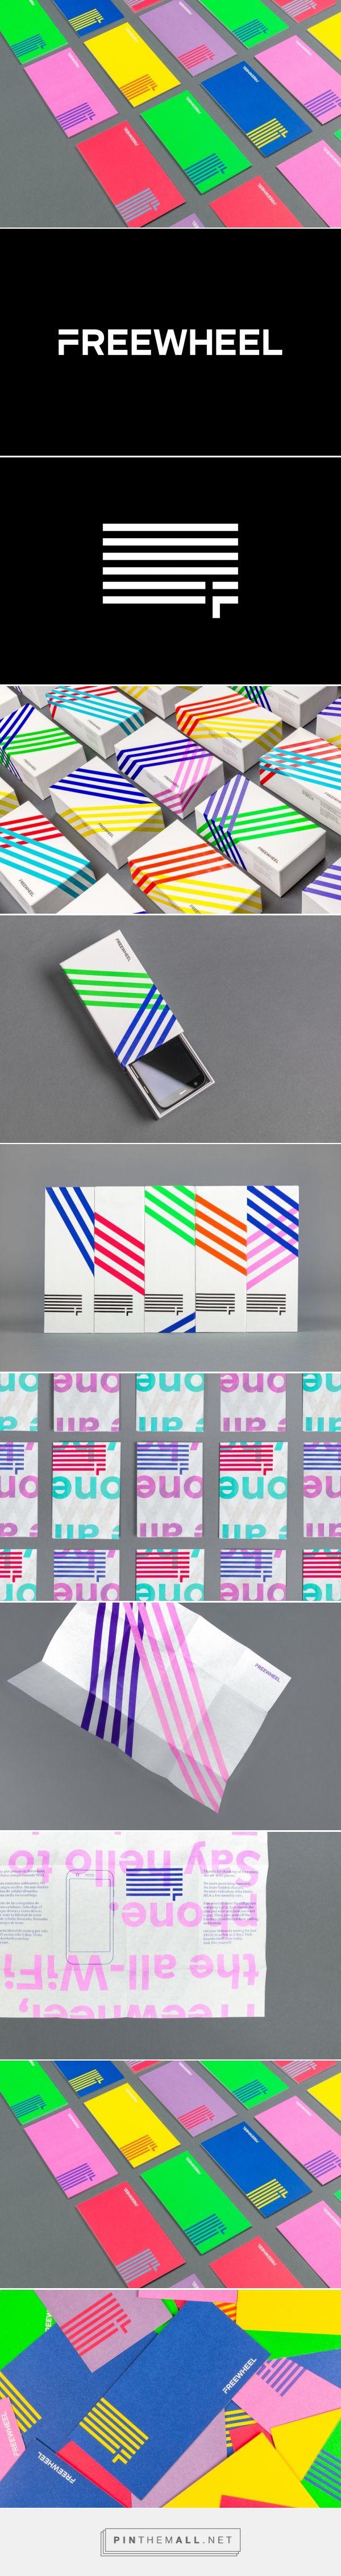 20 best Branding & Visual Identity images on Pinterest